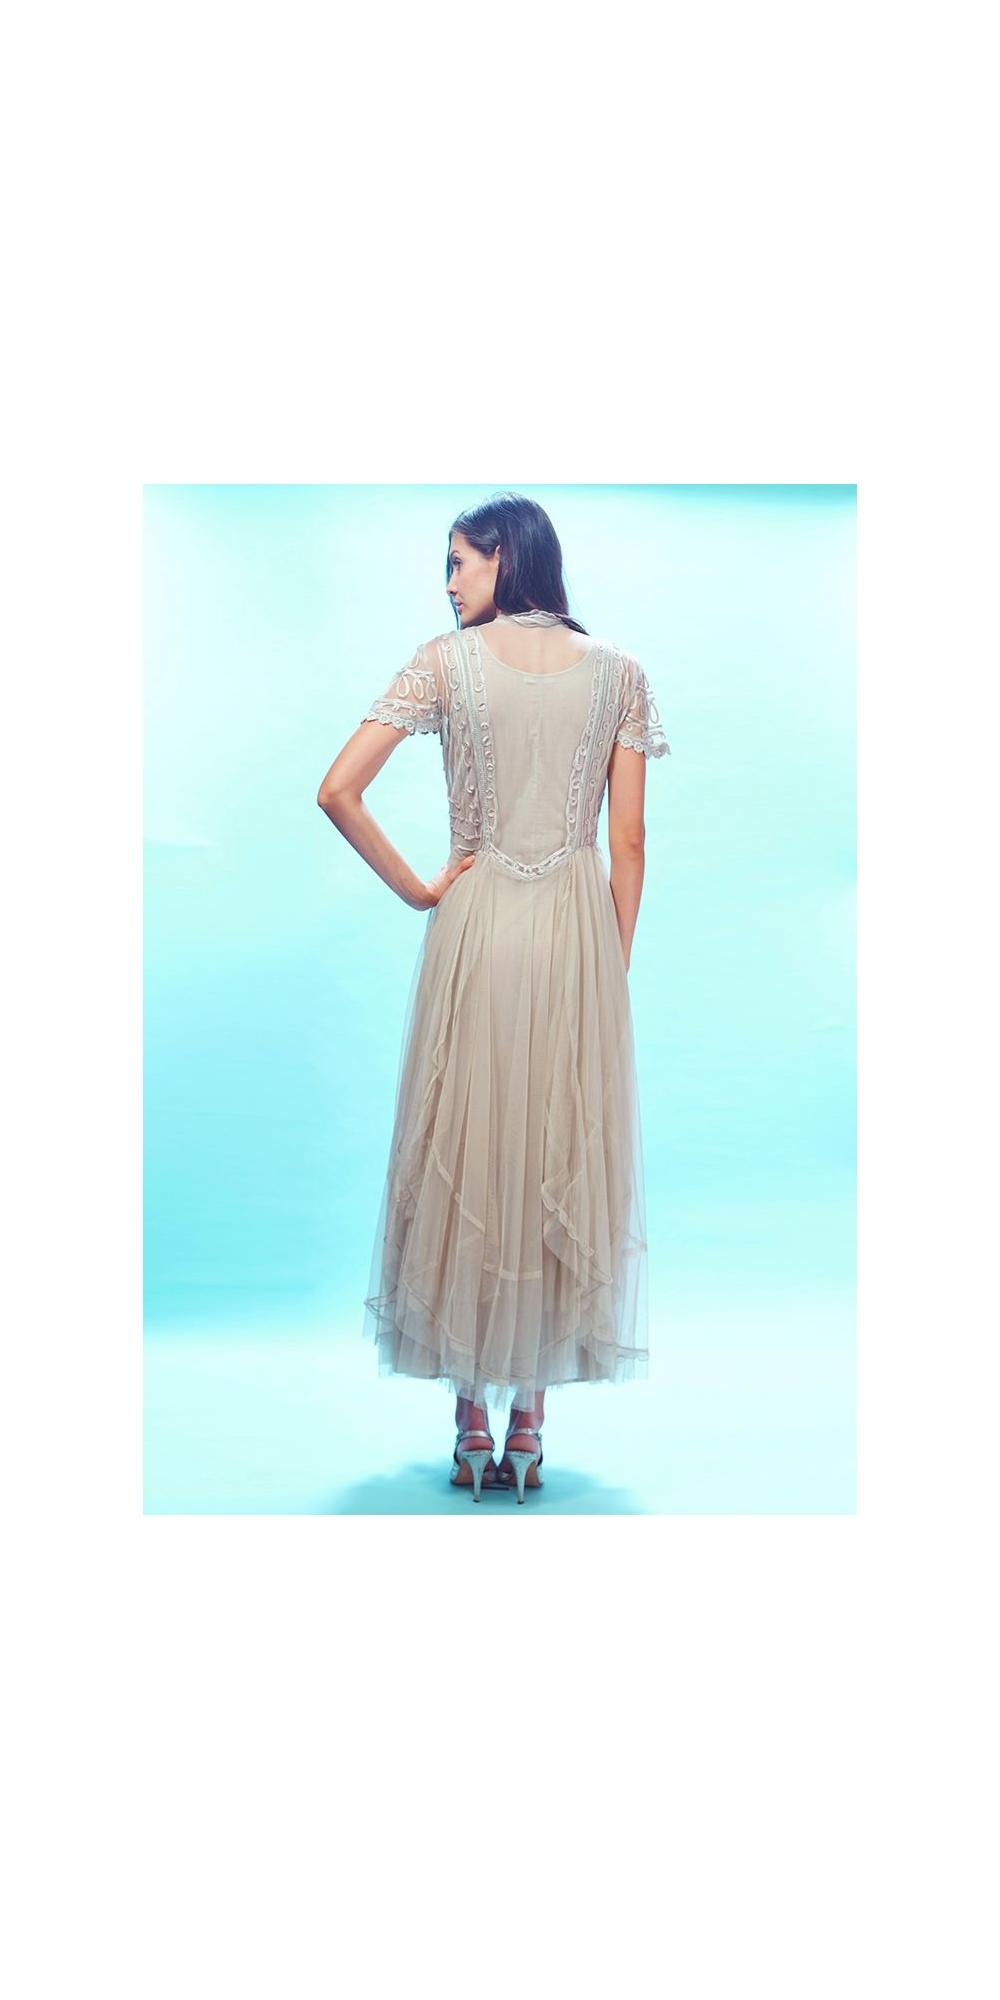 Edwardian Victoria Wedding Dress in Pearl by Nataya